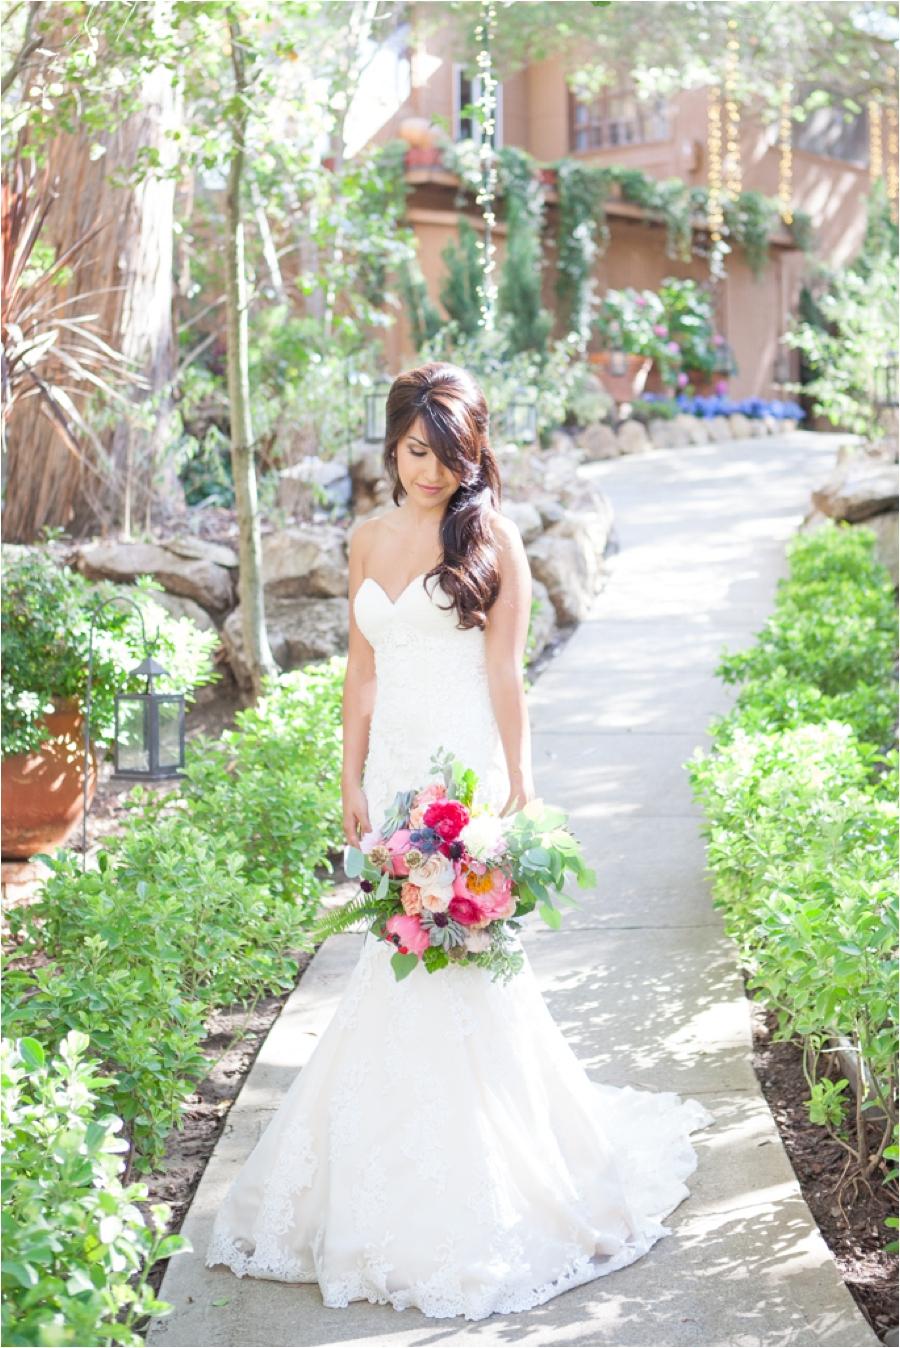 Jasmine and Donny- Calamigos Ranch Wedding ©Shaun and Skyla Walton-39.jpg